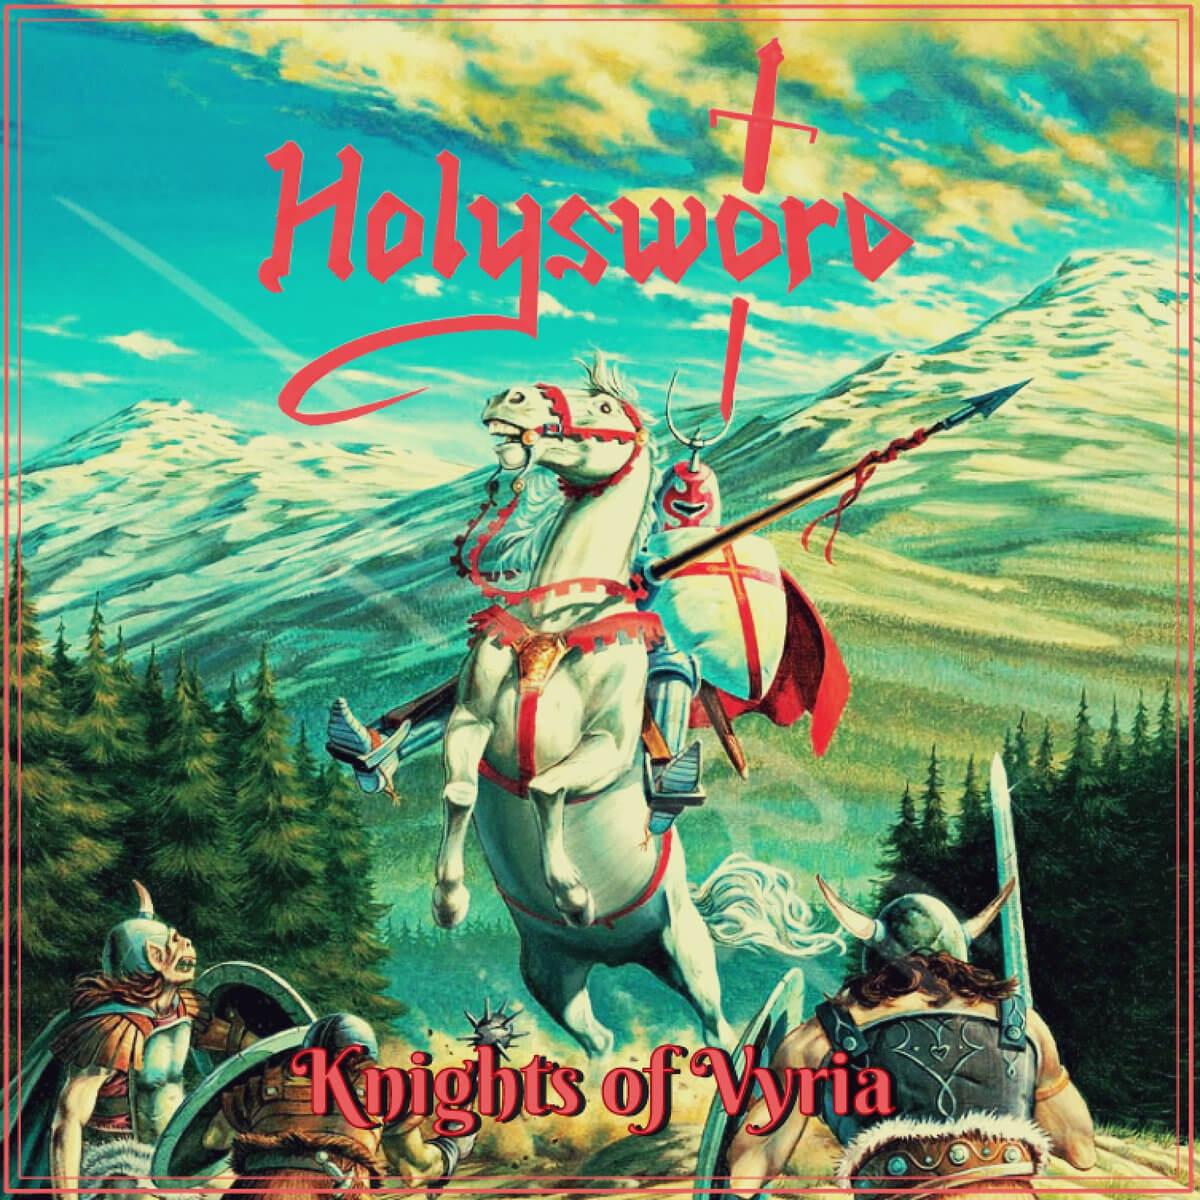 Holysword